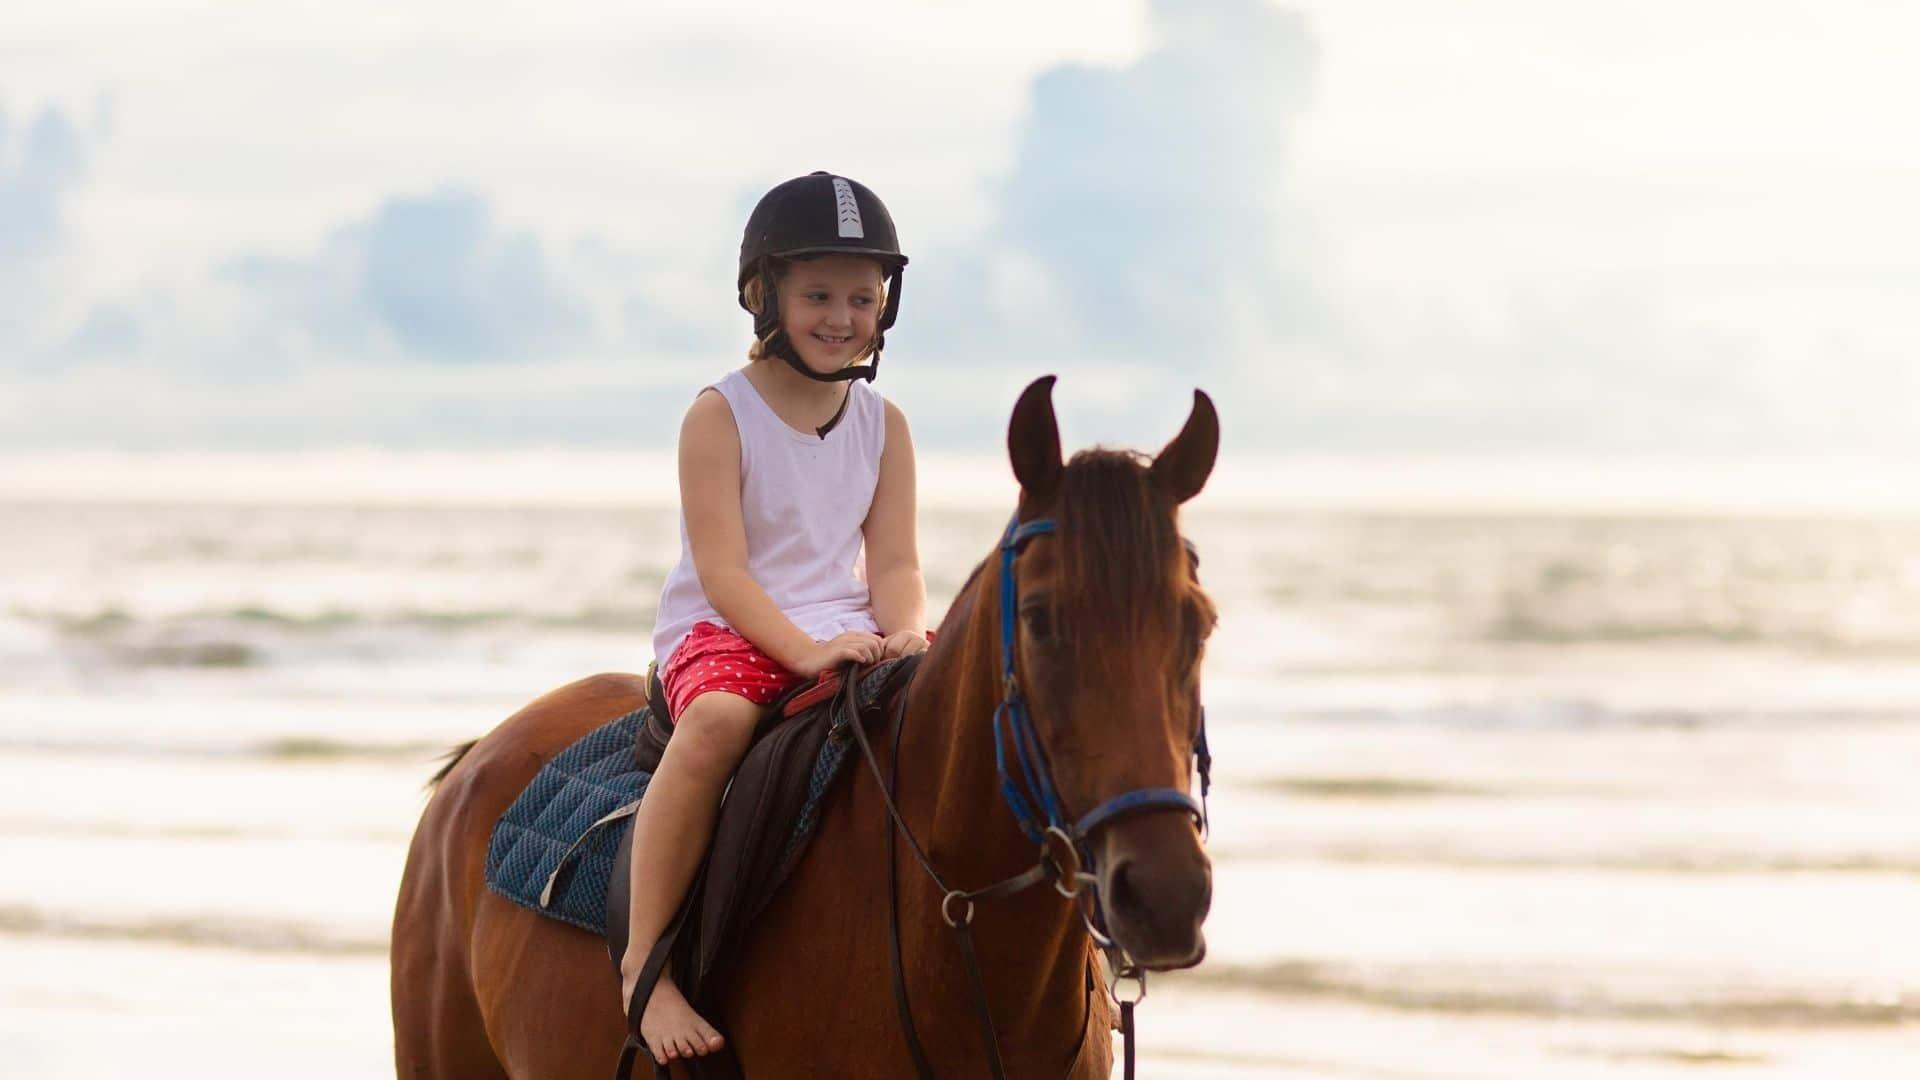 Best Childrens Horse Riding Helmets